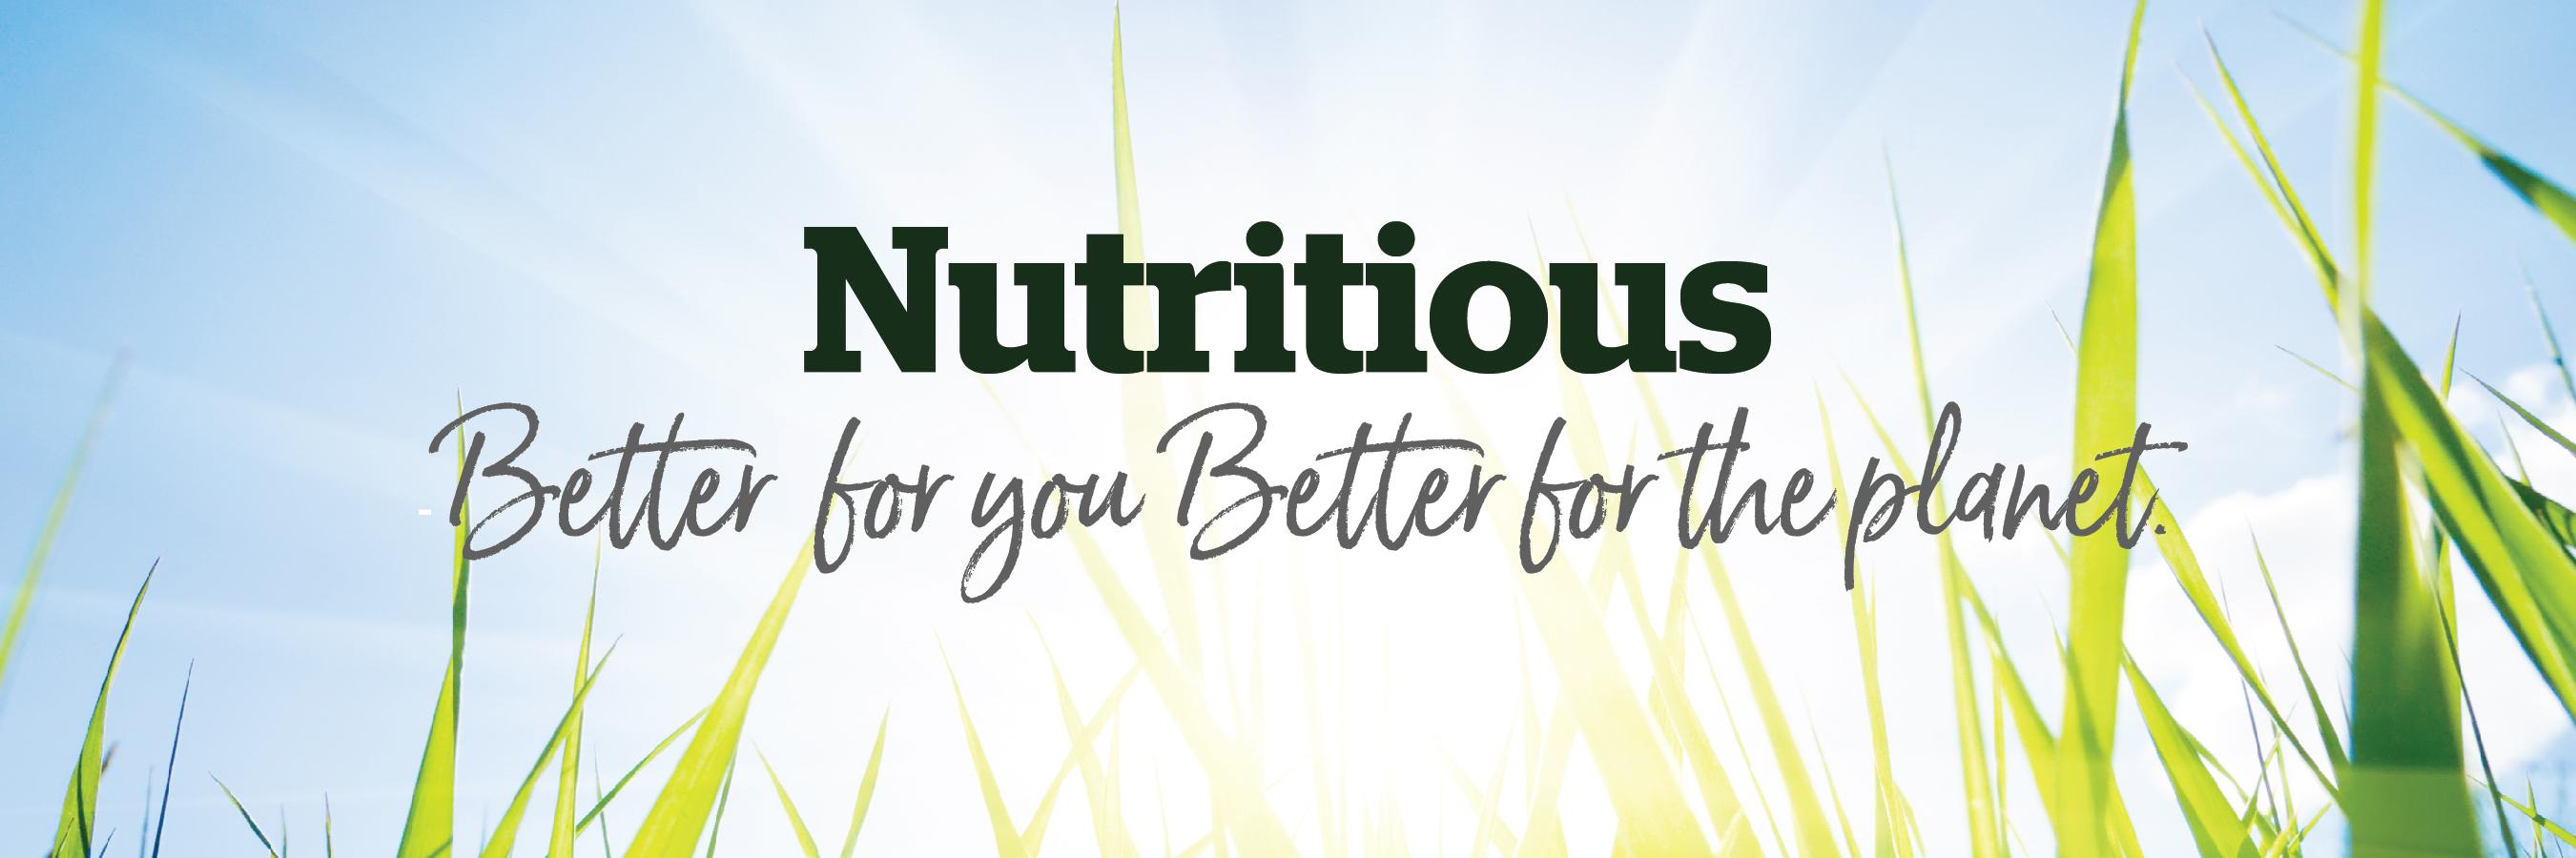 Nutritious-02